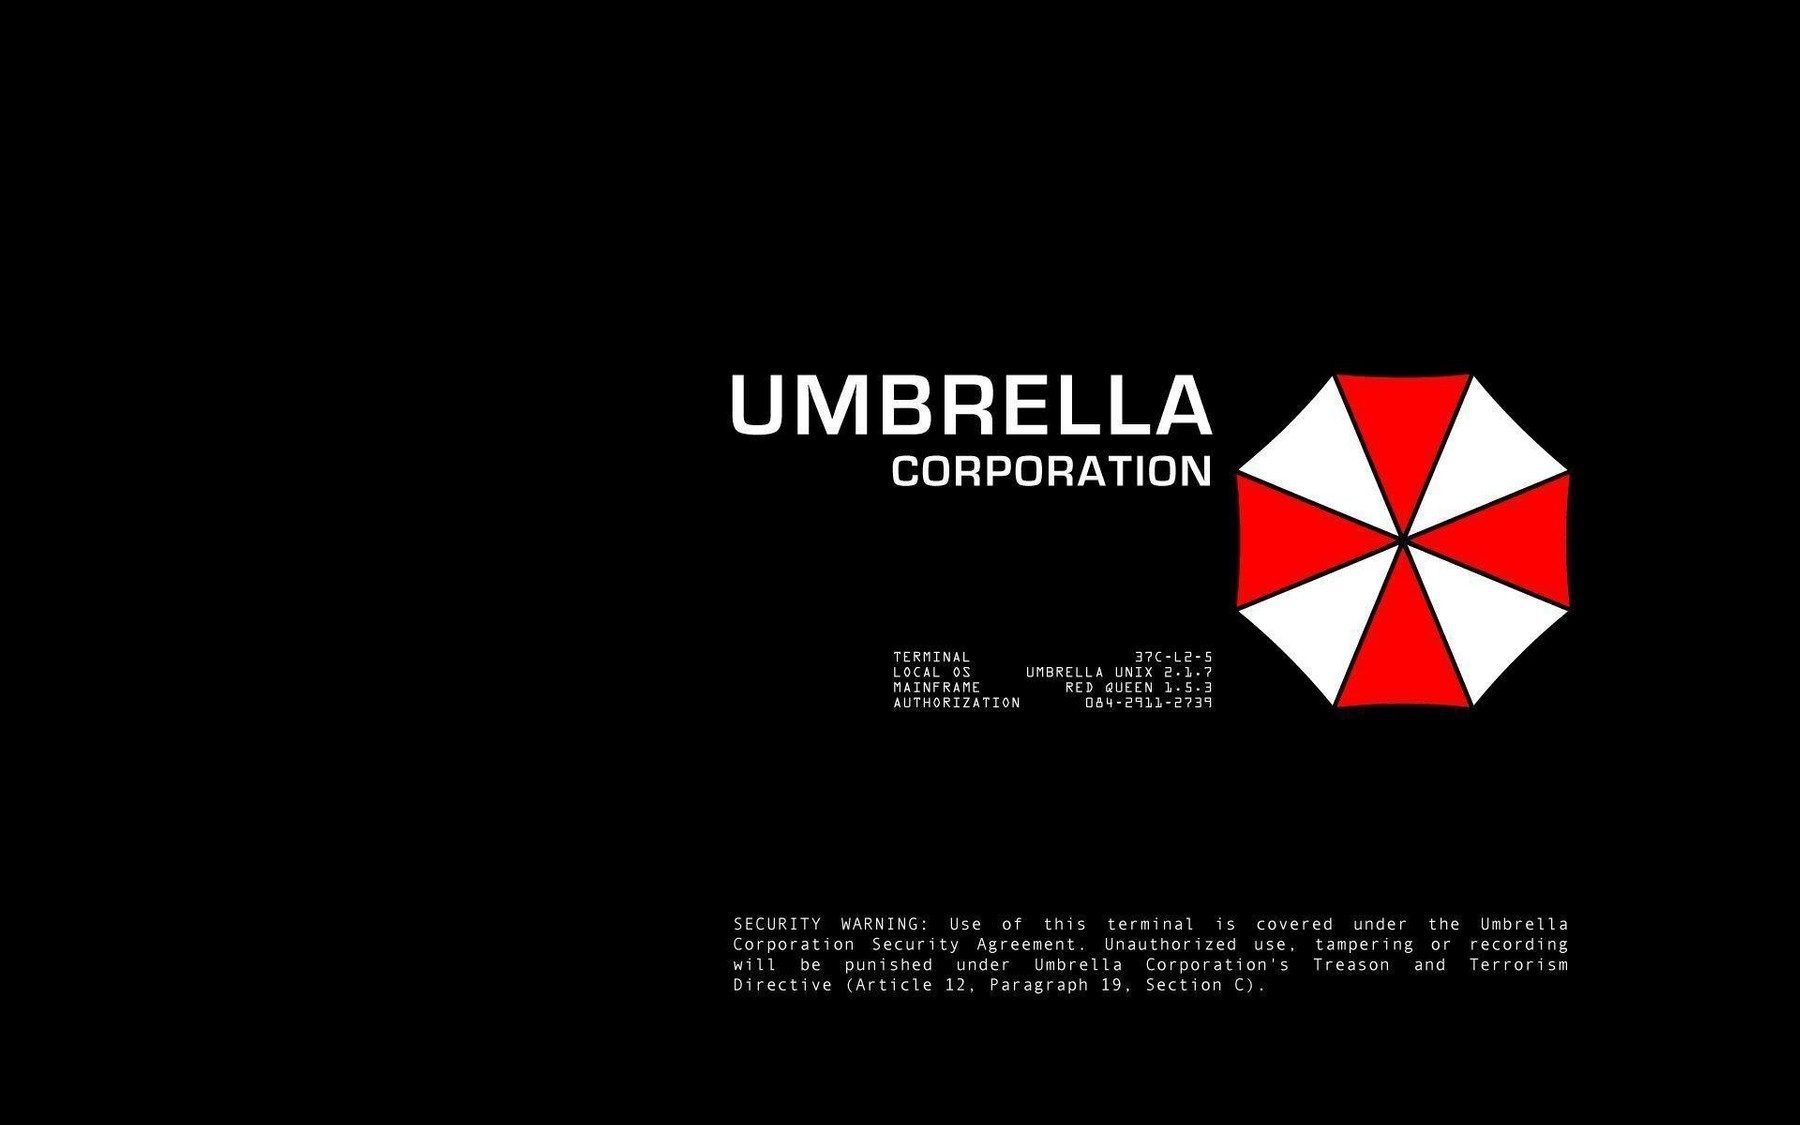 455263-amazing-umbrella-corporation-background-1920x1200-photo.jpg-f=1